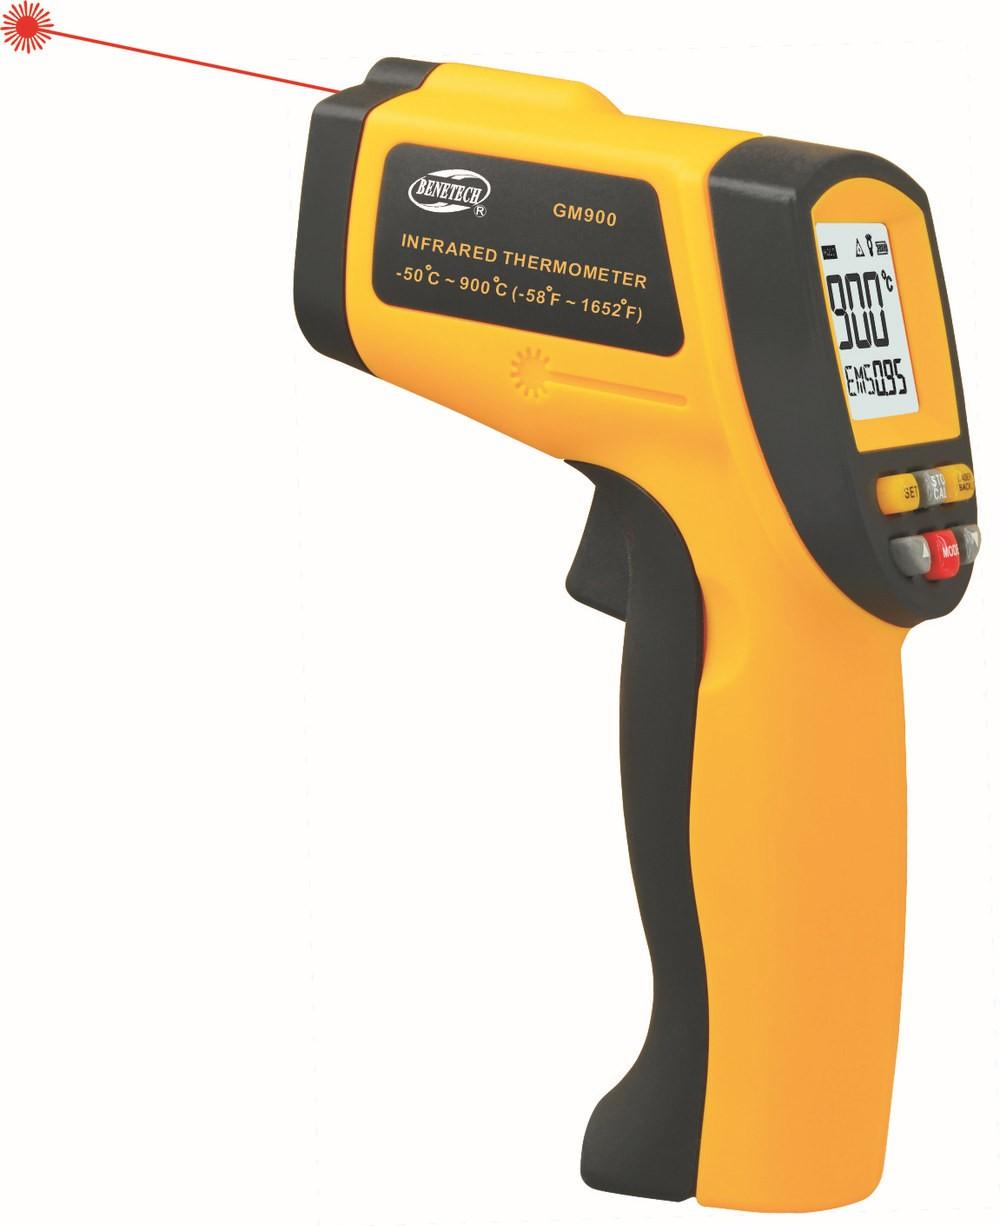 Non-contact-IR-Digital-Infrared-Thermometer-with-Laser-GM900-50-900C-Wholesale IT06-เครื่องวัดอุณหภูมิแบบไม่สัมผัส Benetech รุ่น GM900 Digital Infrared Thermometer -50°C~900°C ( -58°F~1652°F )